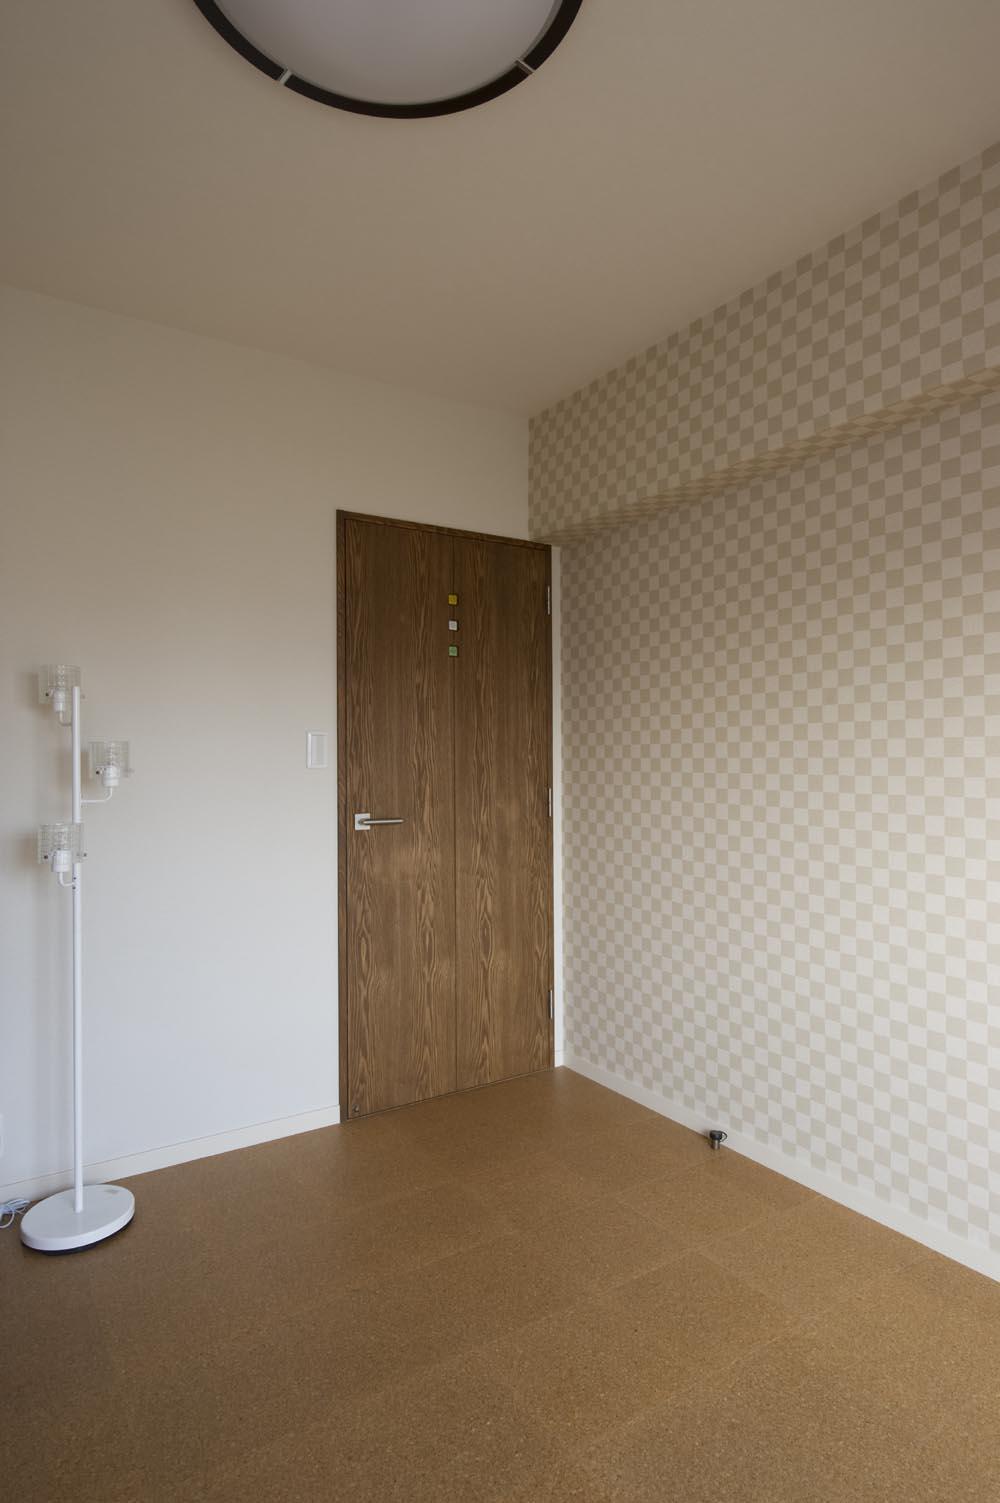 I邸・斜めに配置したキッチンで、動きと変化をの部屋 寝室-ベージュの市松模様のクロス